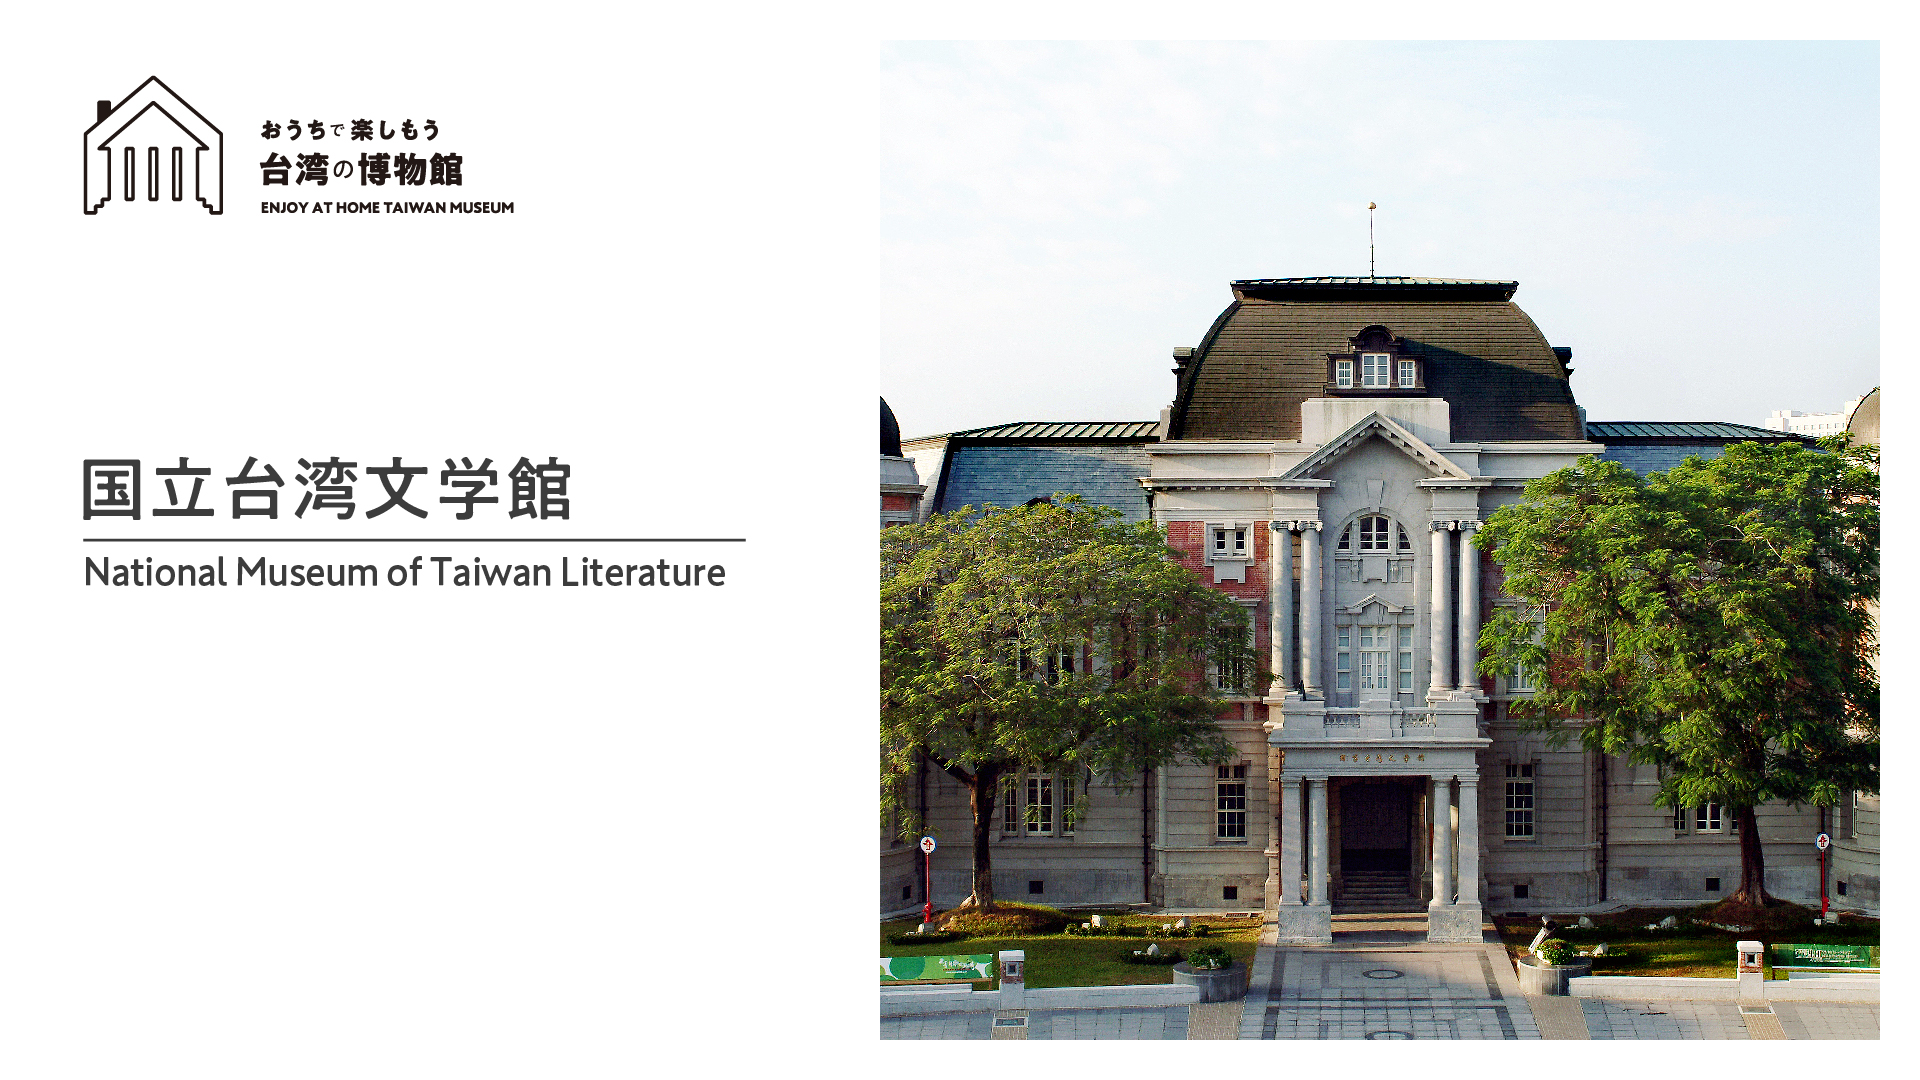 https://jp.taiwan.culture.tw/information_34_119005.html